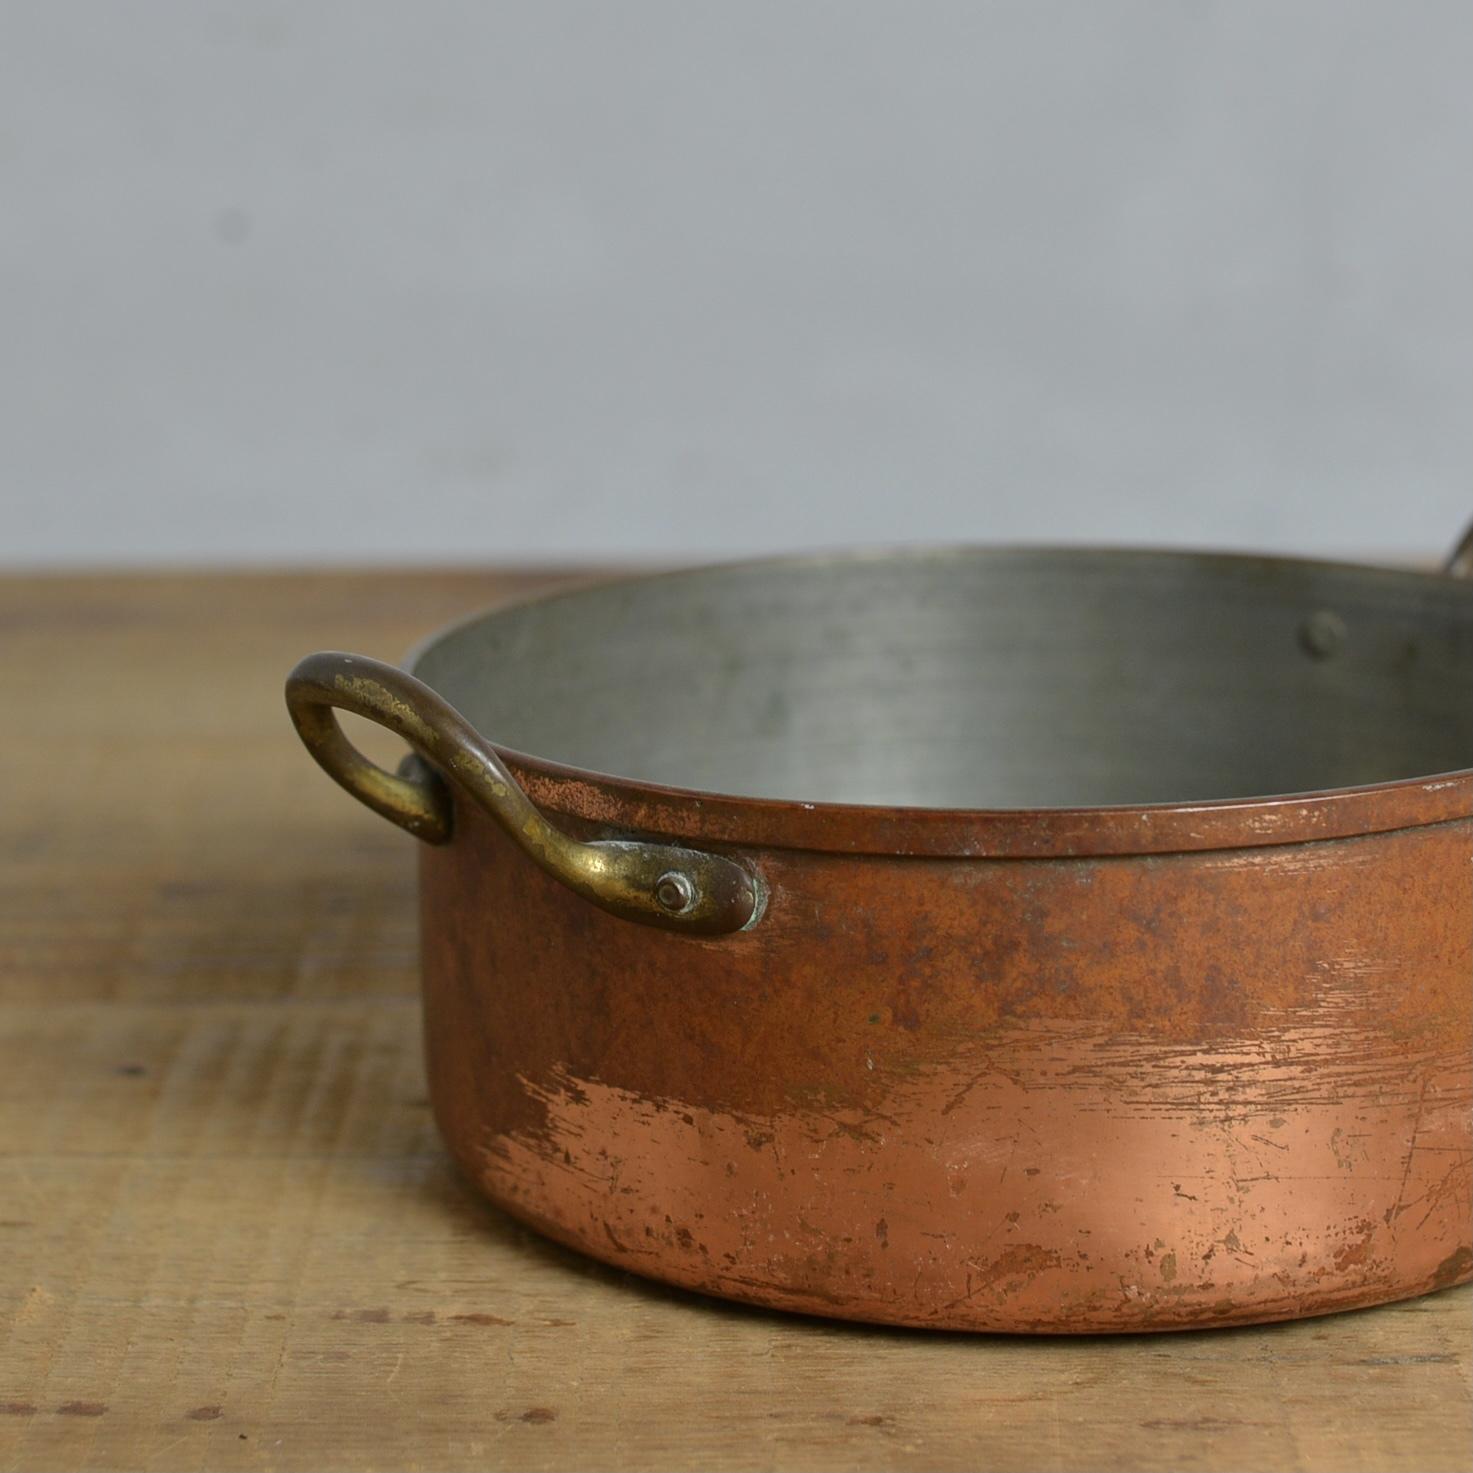 Saucepan / ソースパン【B】〈コッパー・銅・鍋・調理器具・アンティーク・ヴィンテージ〉 112090